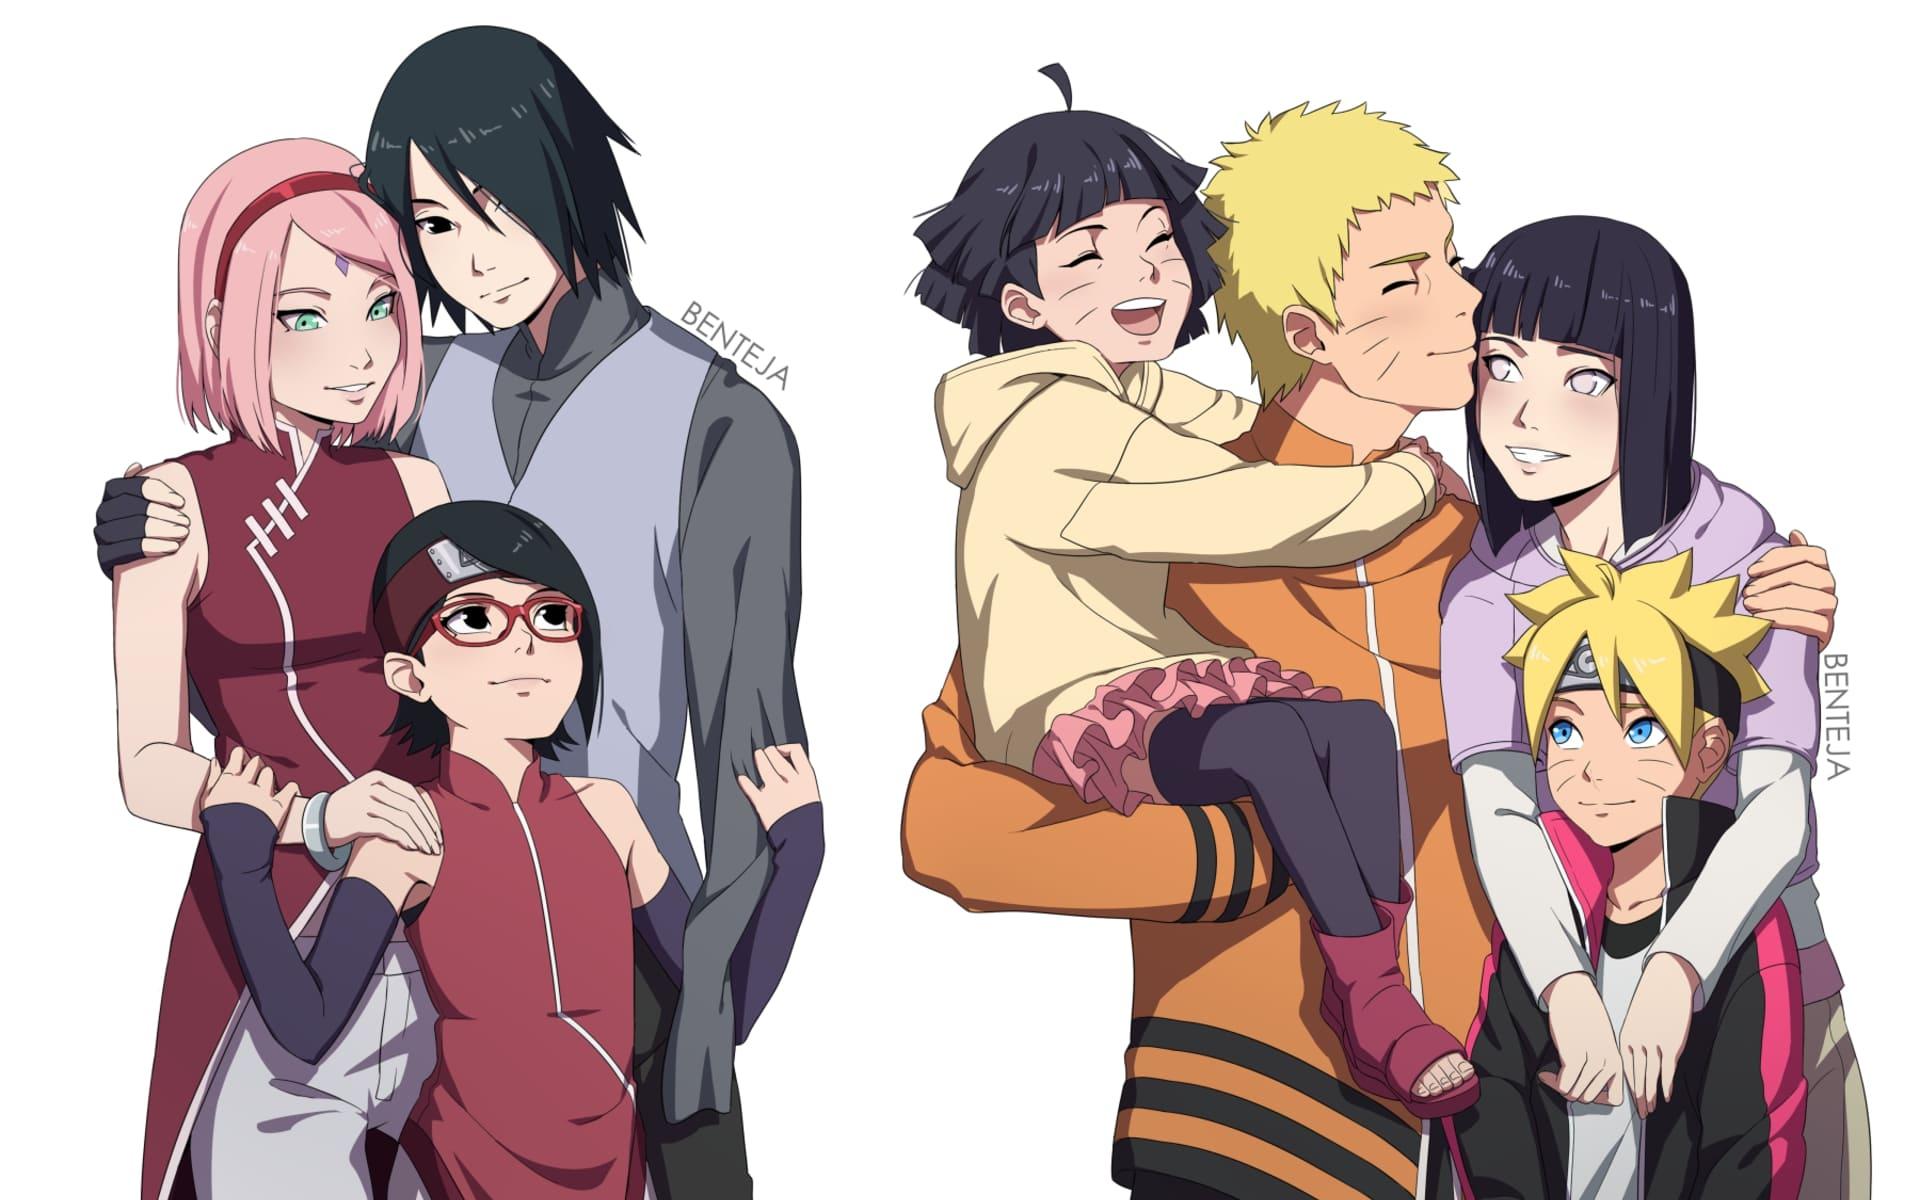 Wallpaper of Anime Naruto Boruto Family background and HD image